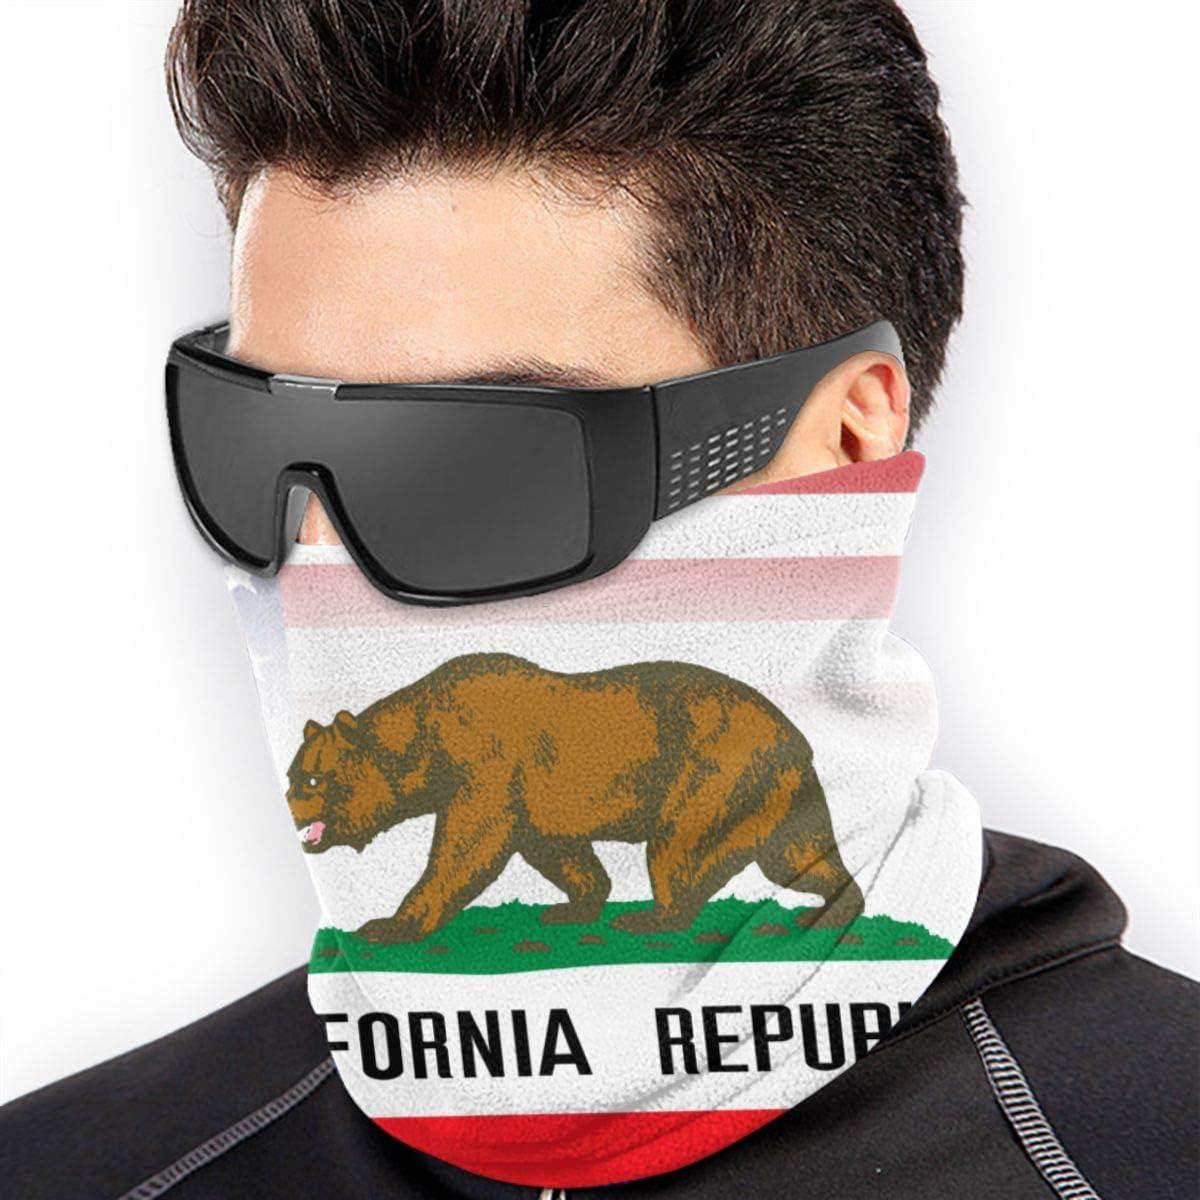 Ear Warmer Headband /& Face Mask Hats Headwear for Cold Weather Winter Outdoor Sports Black USA California Flag Combo Winter Neck Warmer Gaiter//Balaclava Ski Face Mask Cover Neck Gaiter Tube